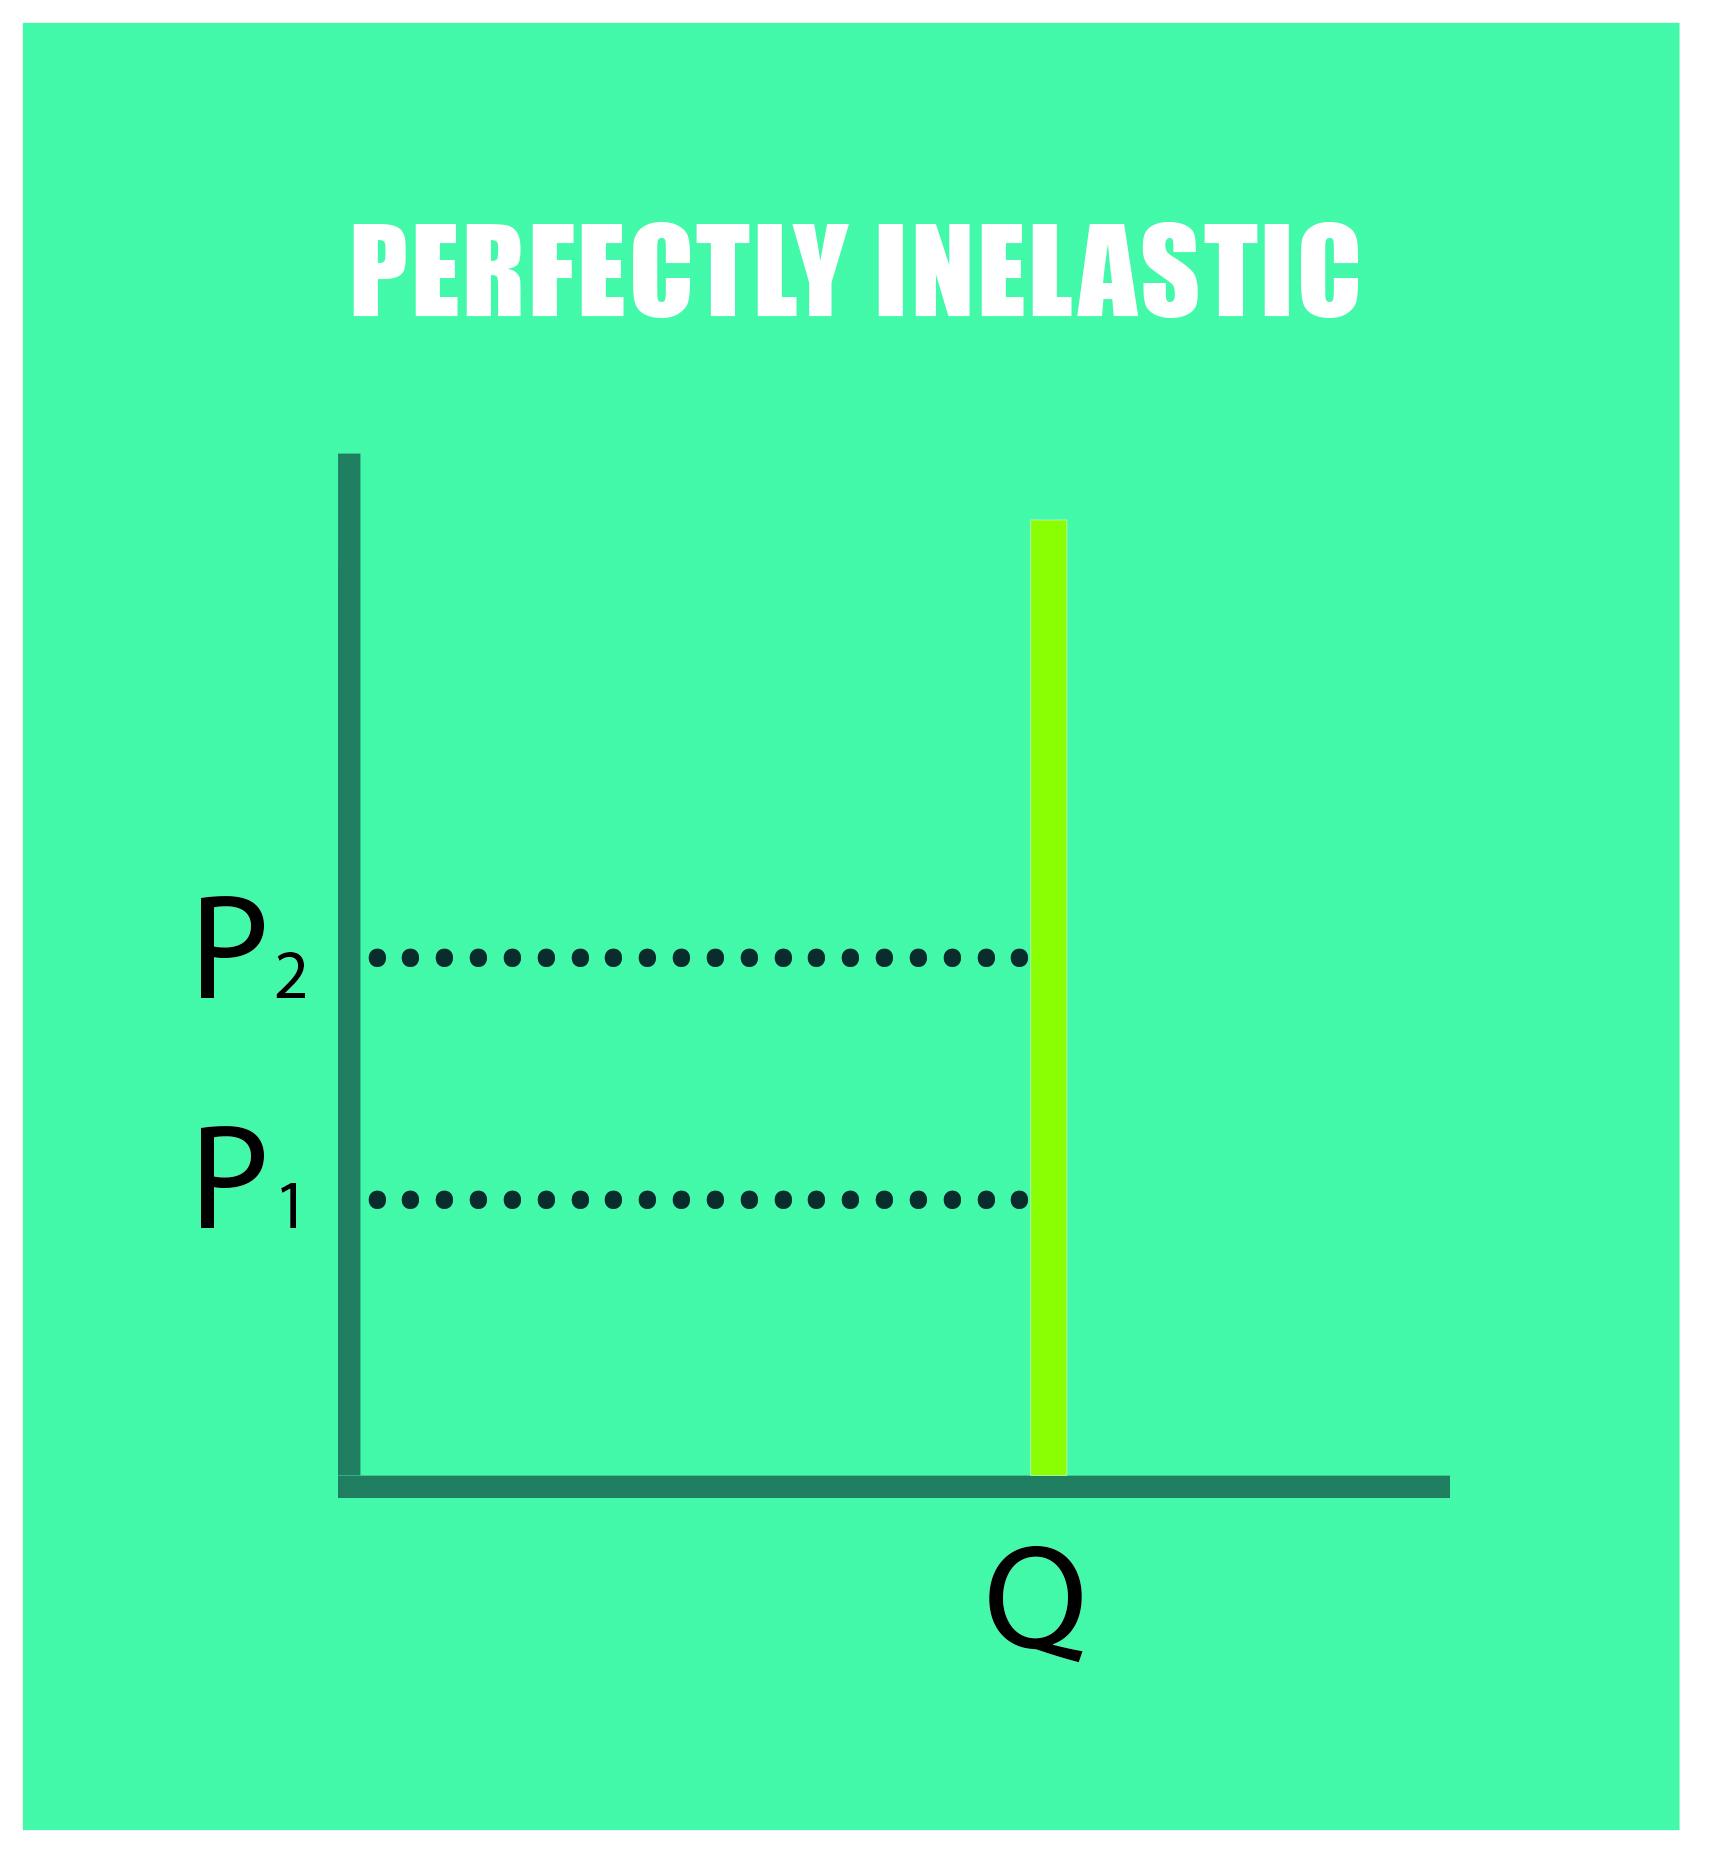 Perfectly elastic